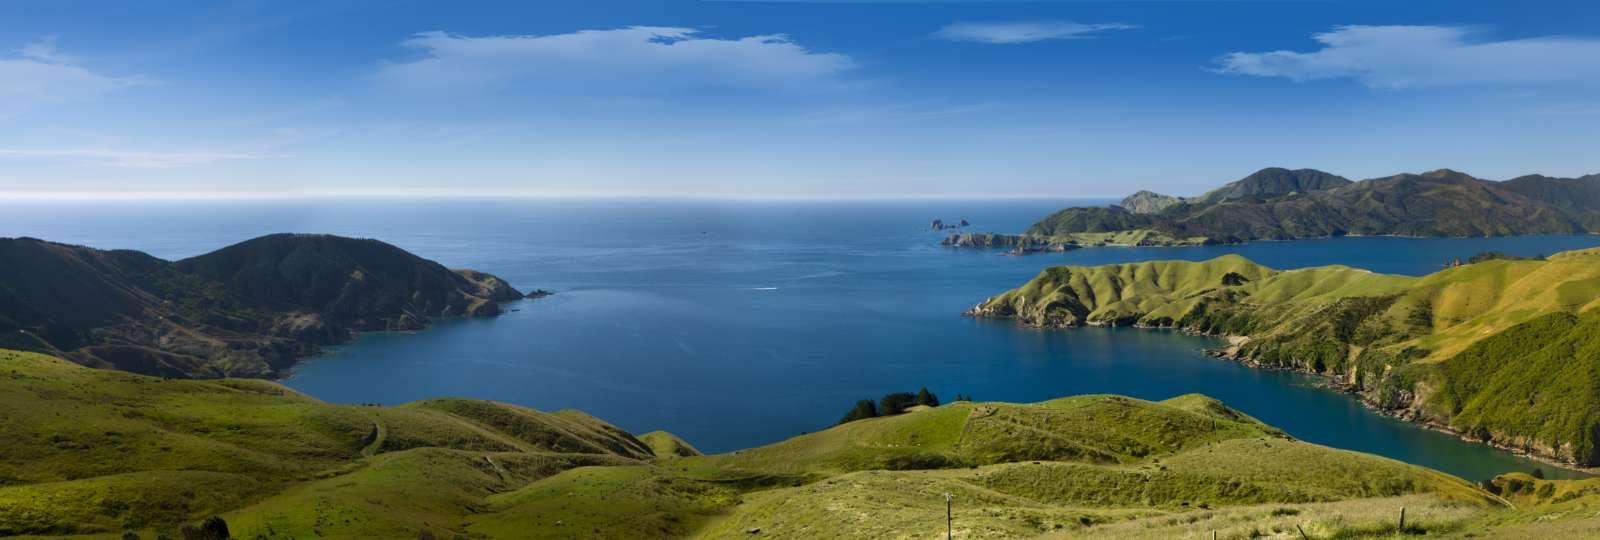 Stunning Marlborough sounds